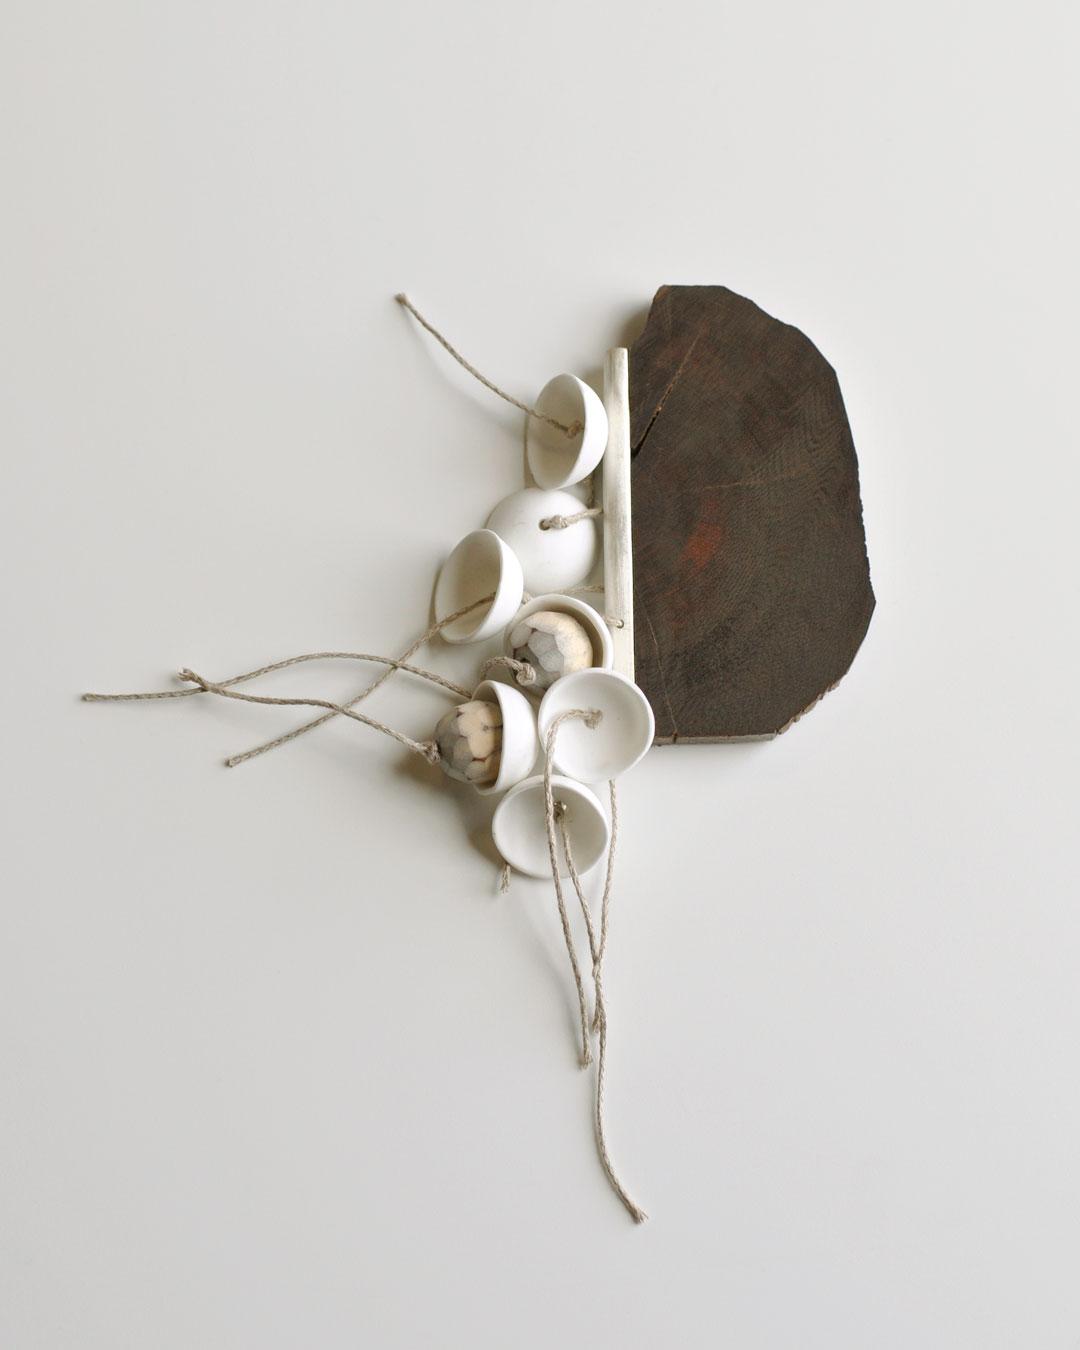 Chequita Nahar, Switi Watra, 2010, brooch; snakewood, porcelain, pine, silver, cord, 110 x 140 x 280 mm, €950